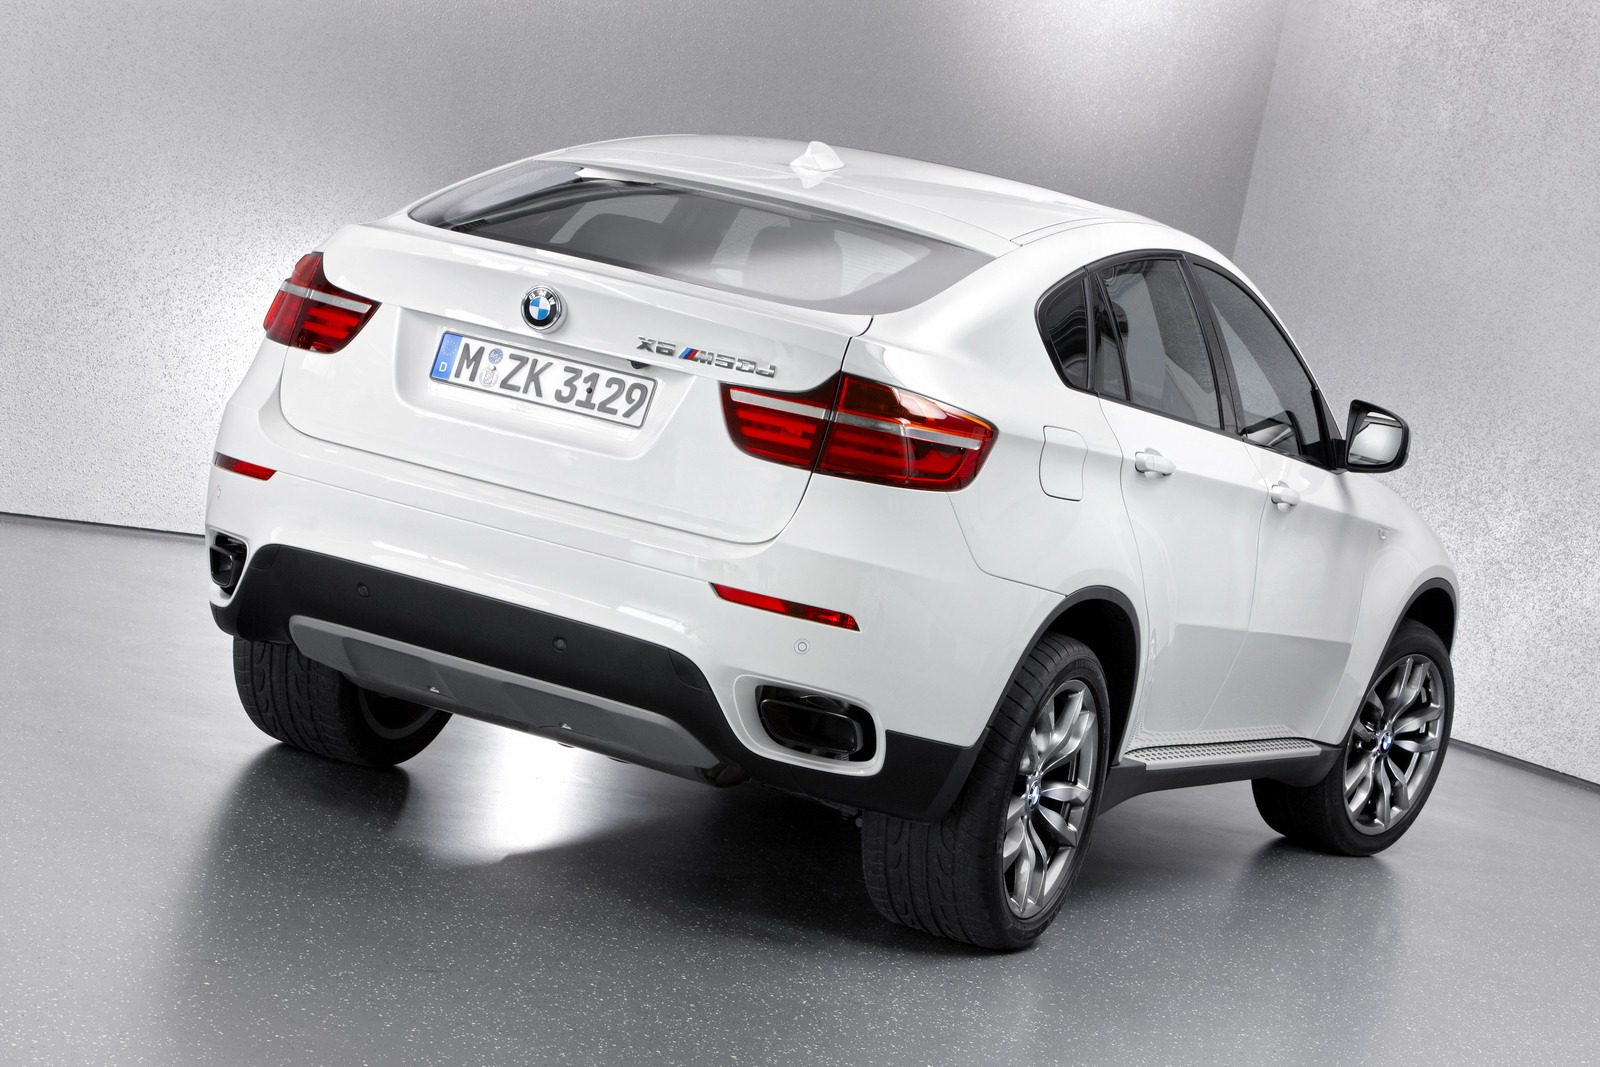 http://2.bp.blogspot.com/-Cqu4VQ8fbIc/T7zbNz-khnI/AAAAAAAAAOc/-2a6WS_YtEY/s1600/BMW-X6-M50d-4%5B2%5D.jpg